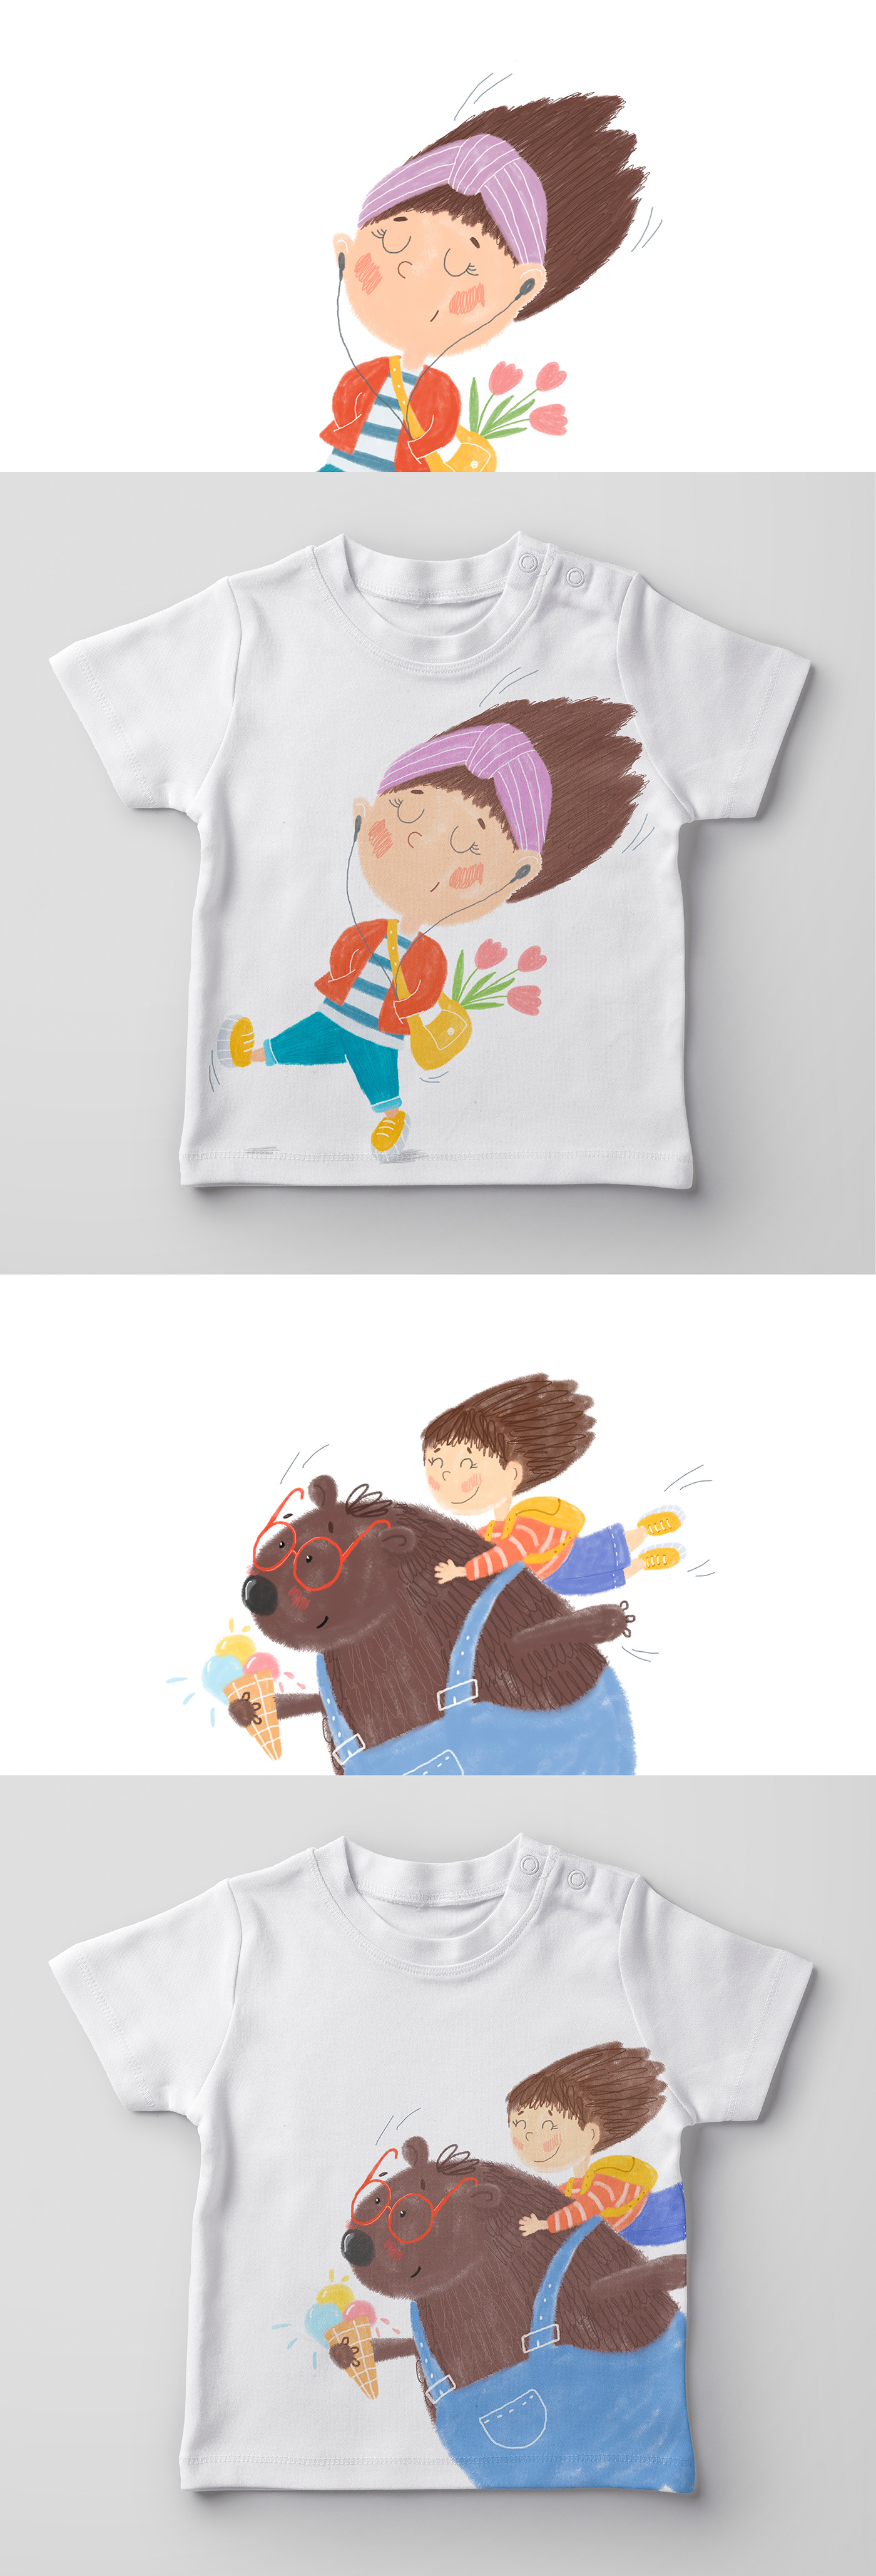 Character children clothes Fashion  illustartion pattern textile